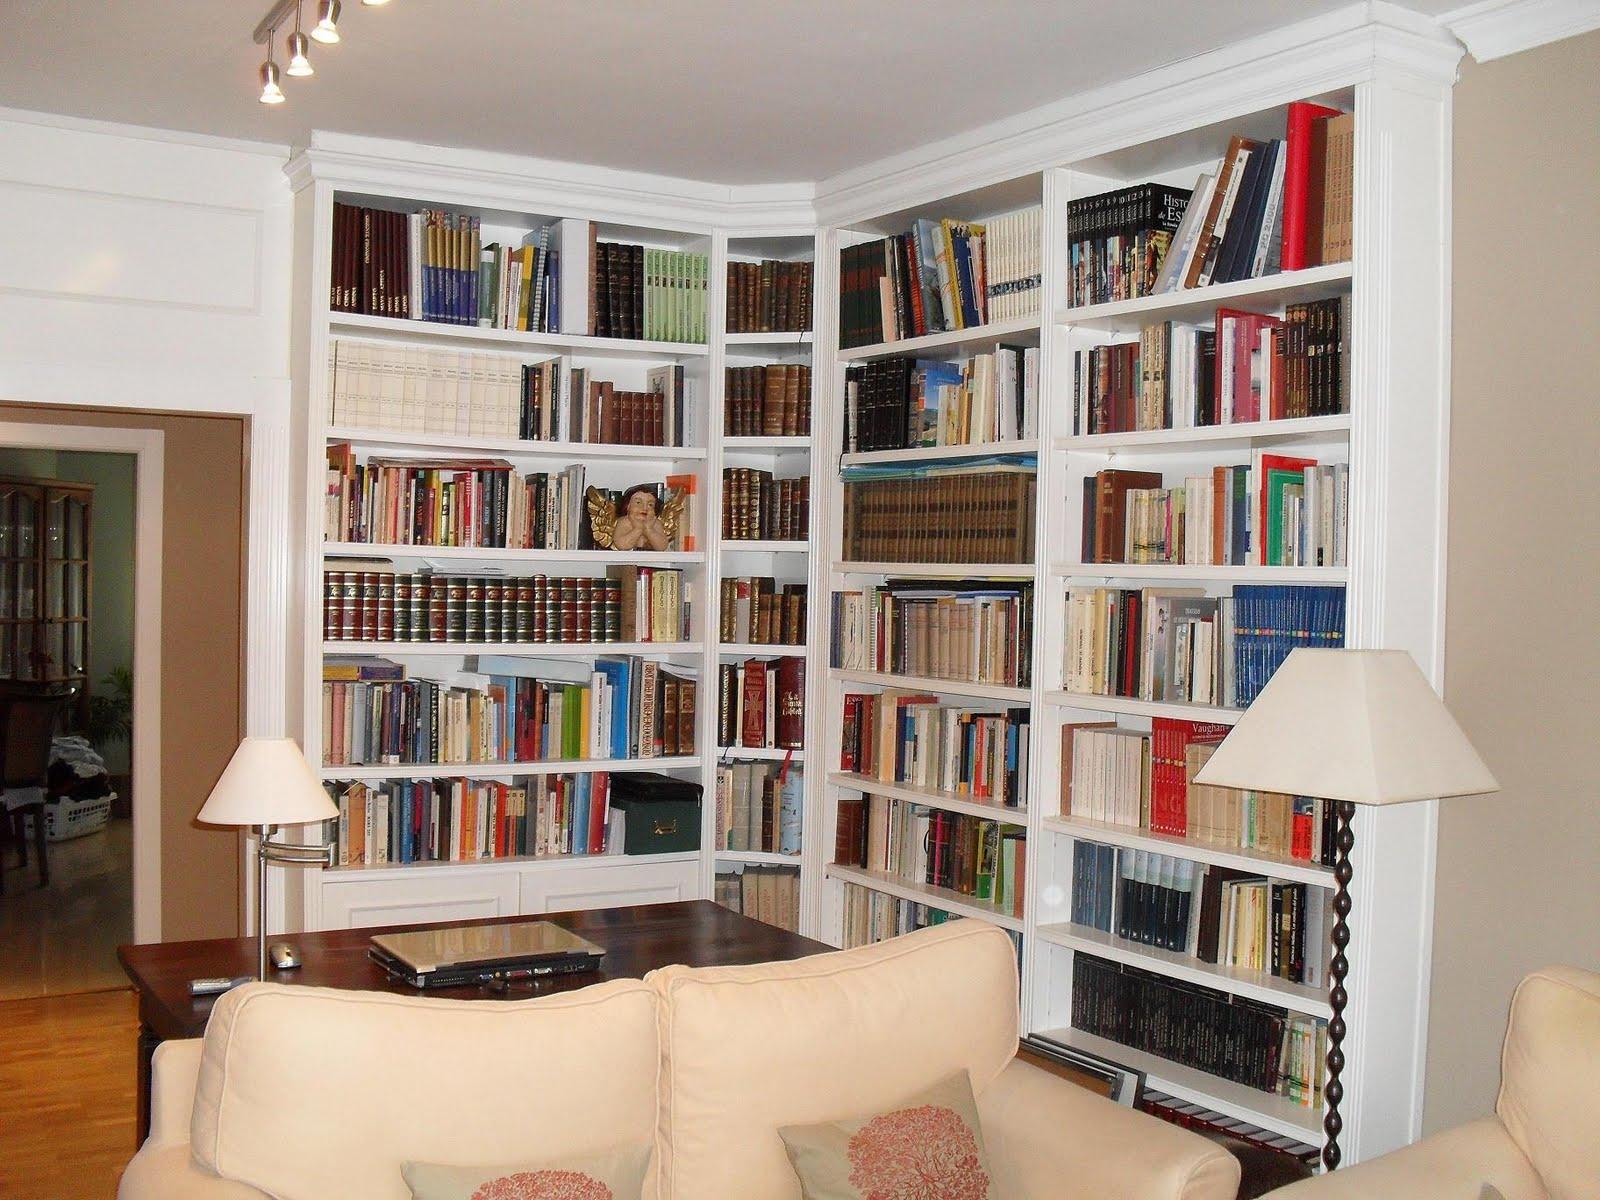 librerias a medida madrid muebles librerias lacadas de